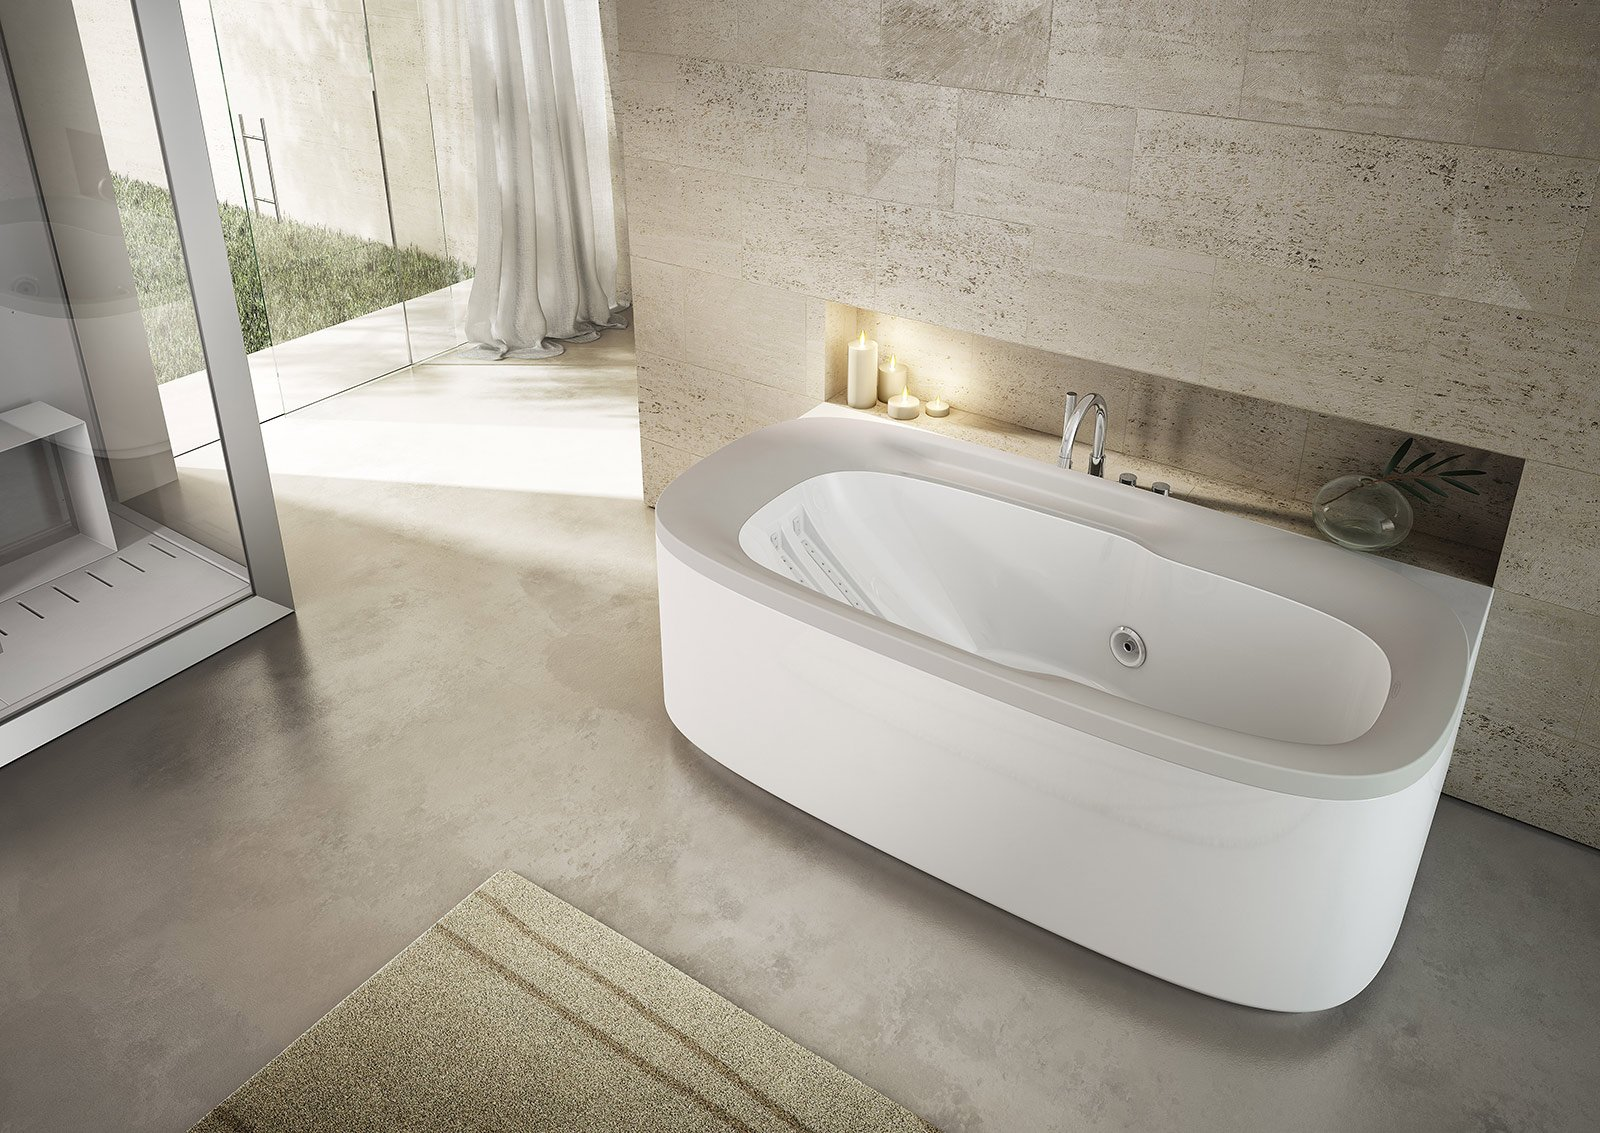 Vasche da bagno novit del cersaie 2013 cose di casa - Ricoprire vasca da bagno ...